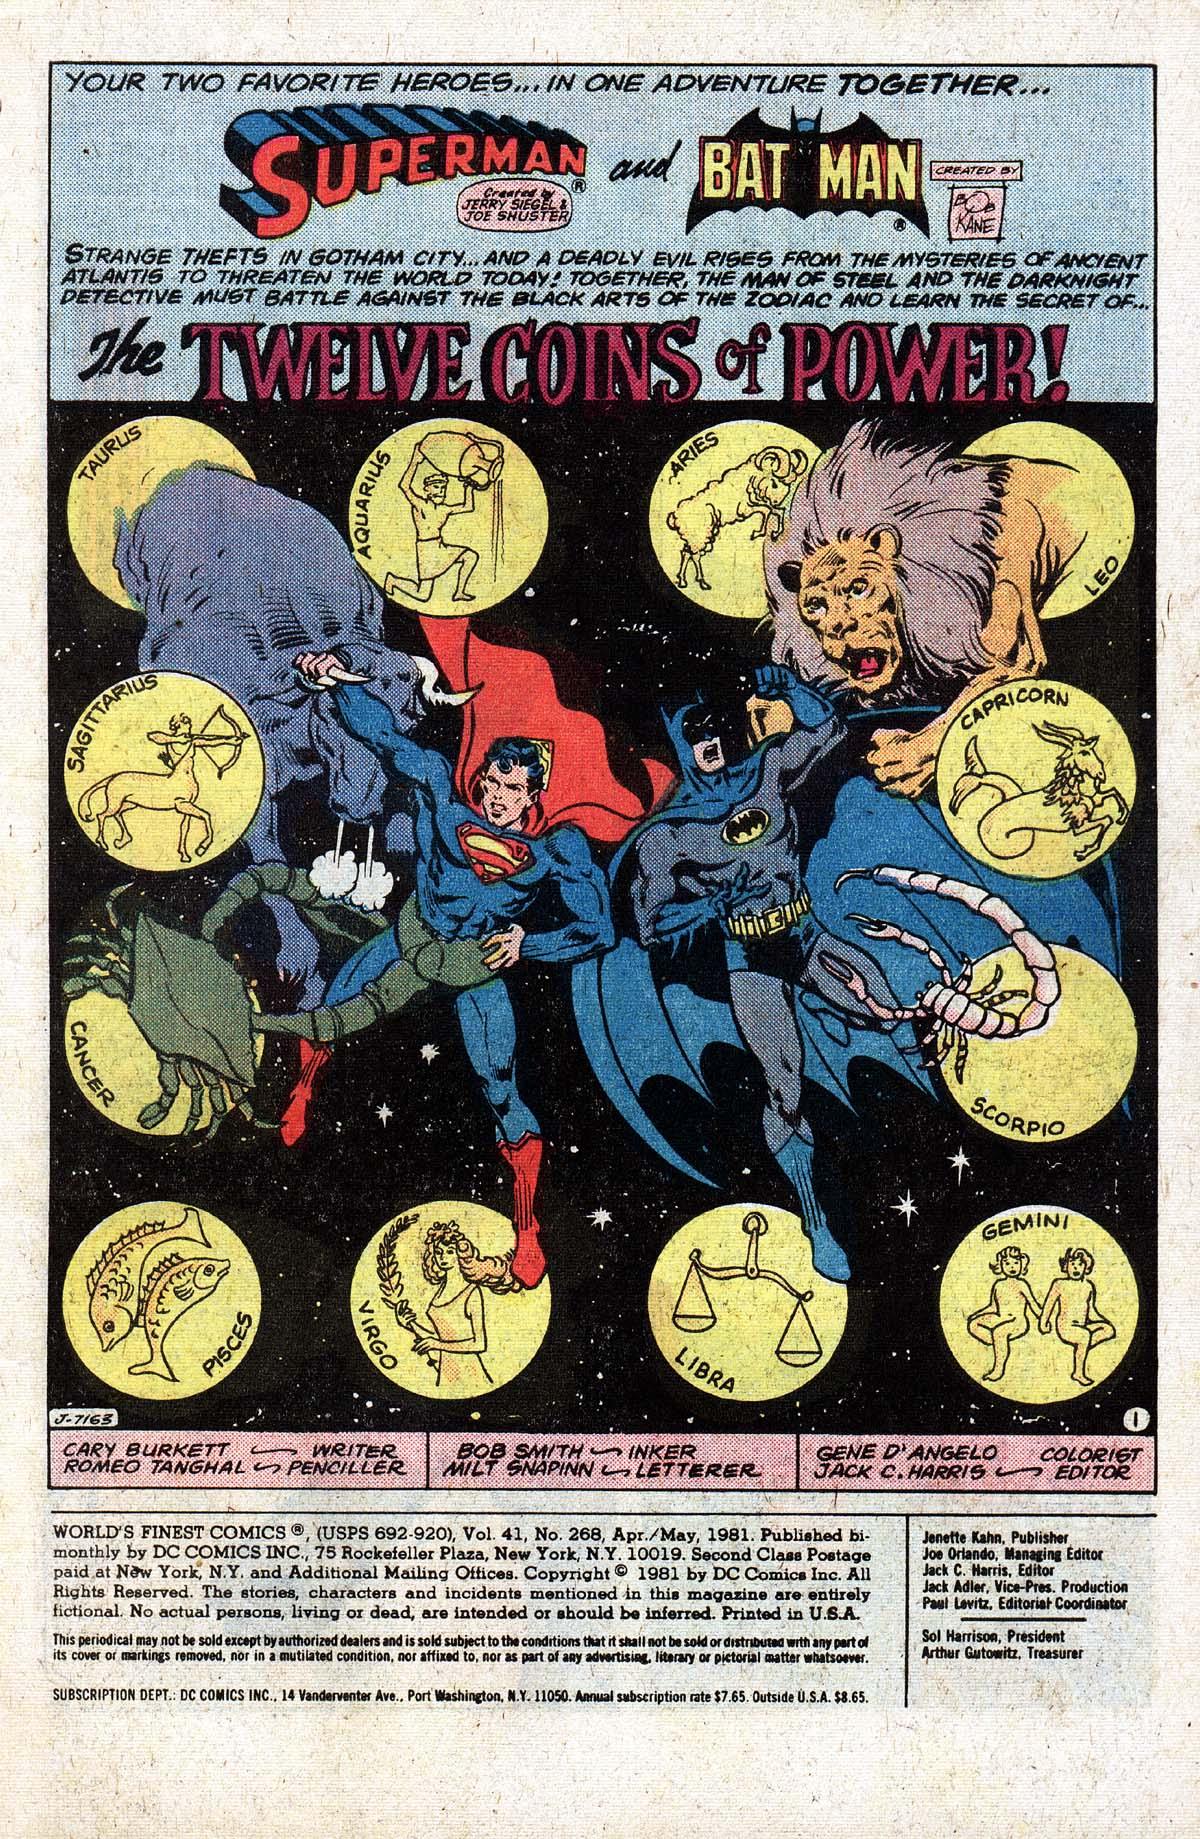 Read online World's Finest Comics comic -  Issue #268 - 3